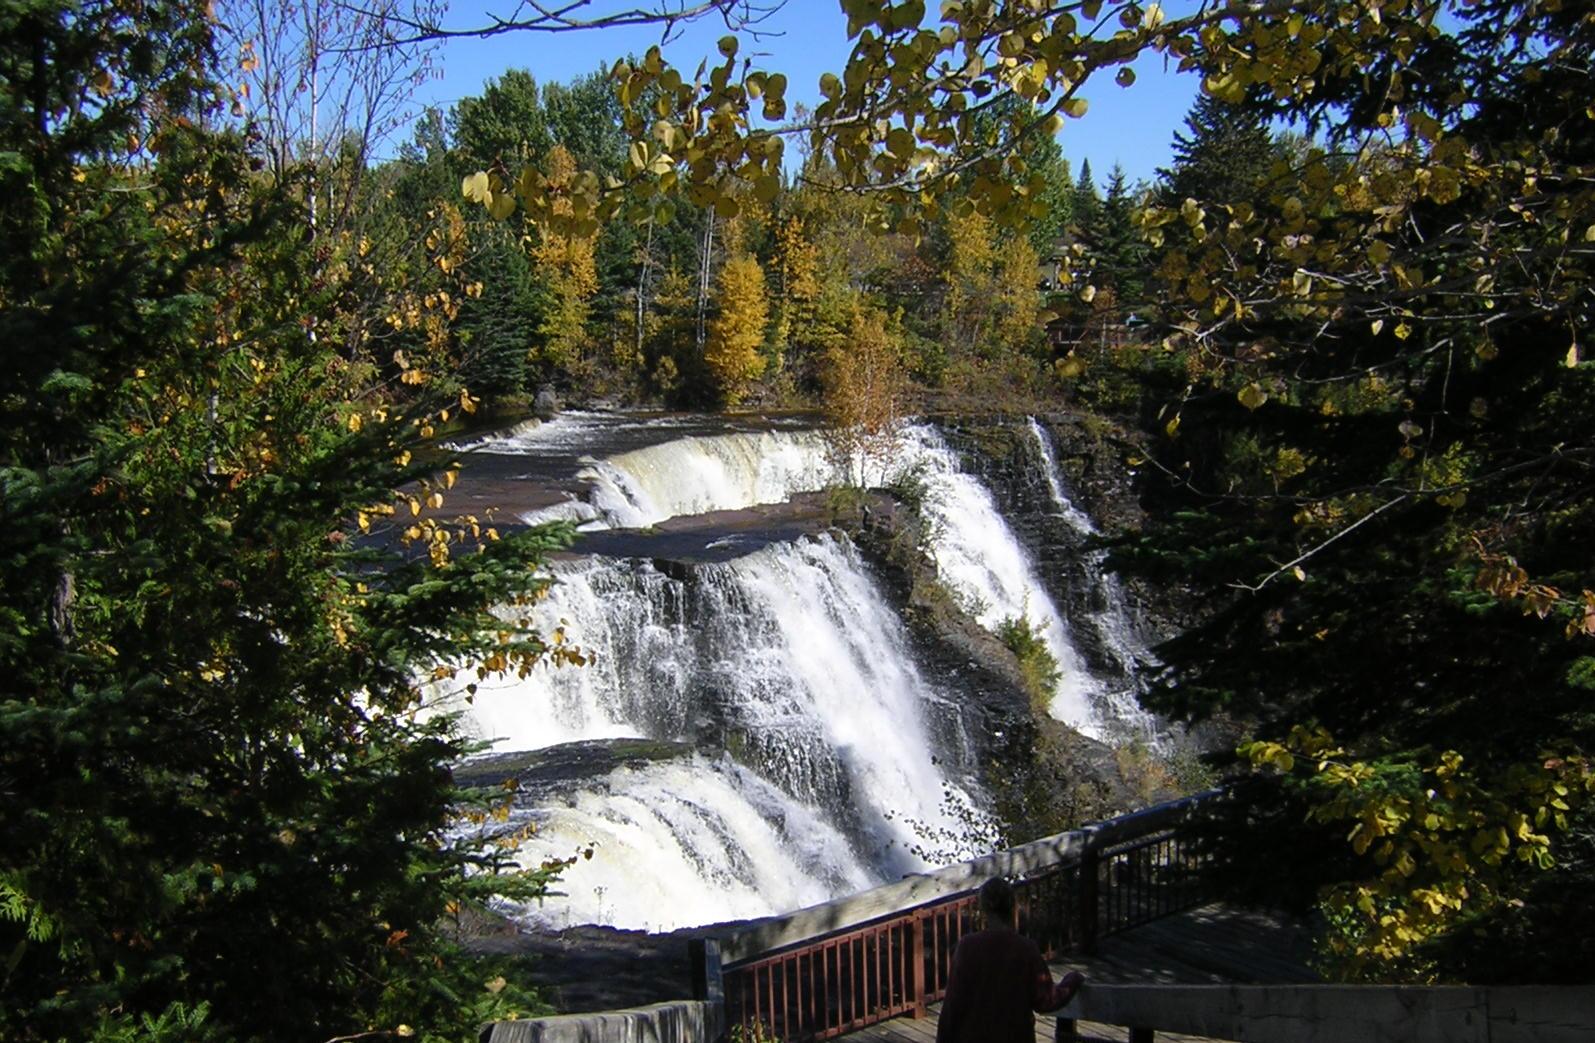 Canadian waterfall photo